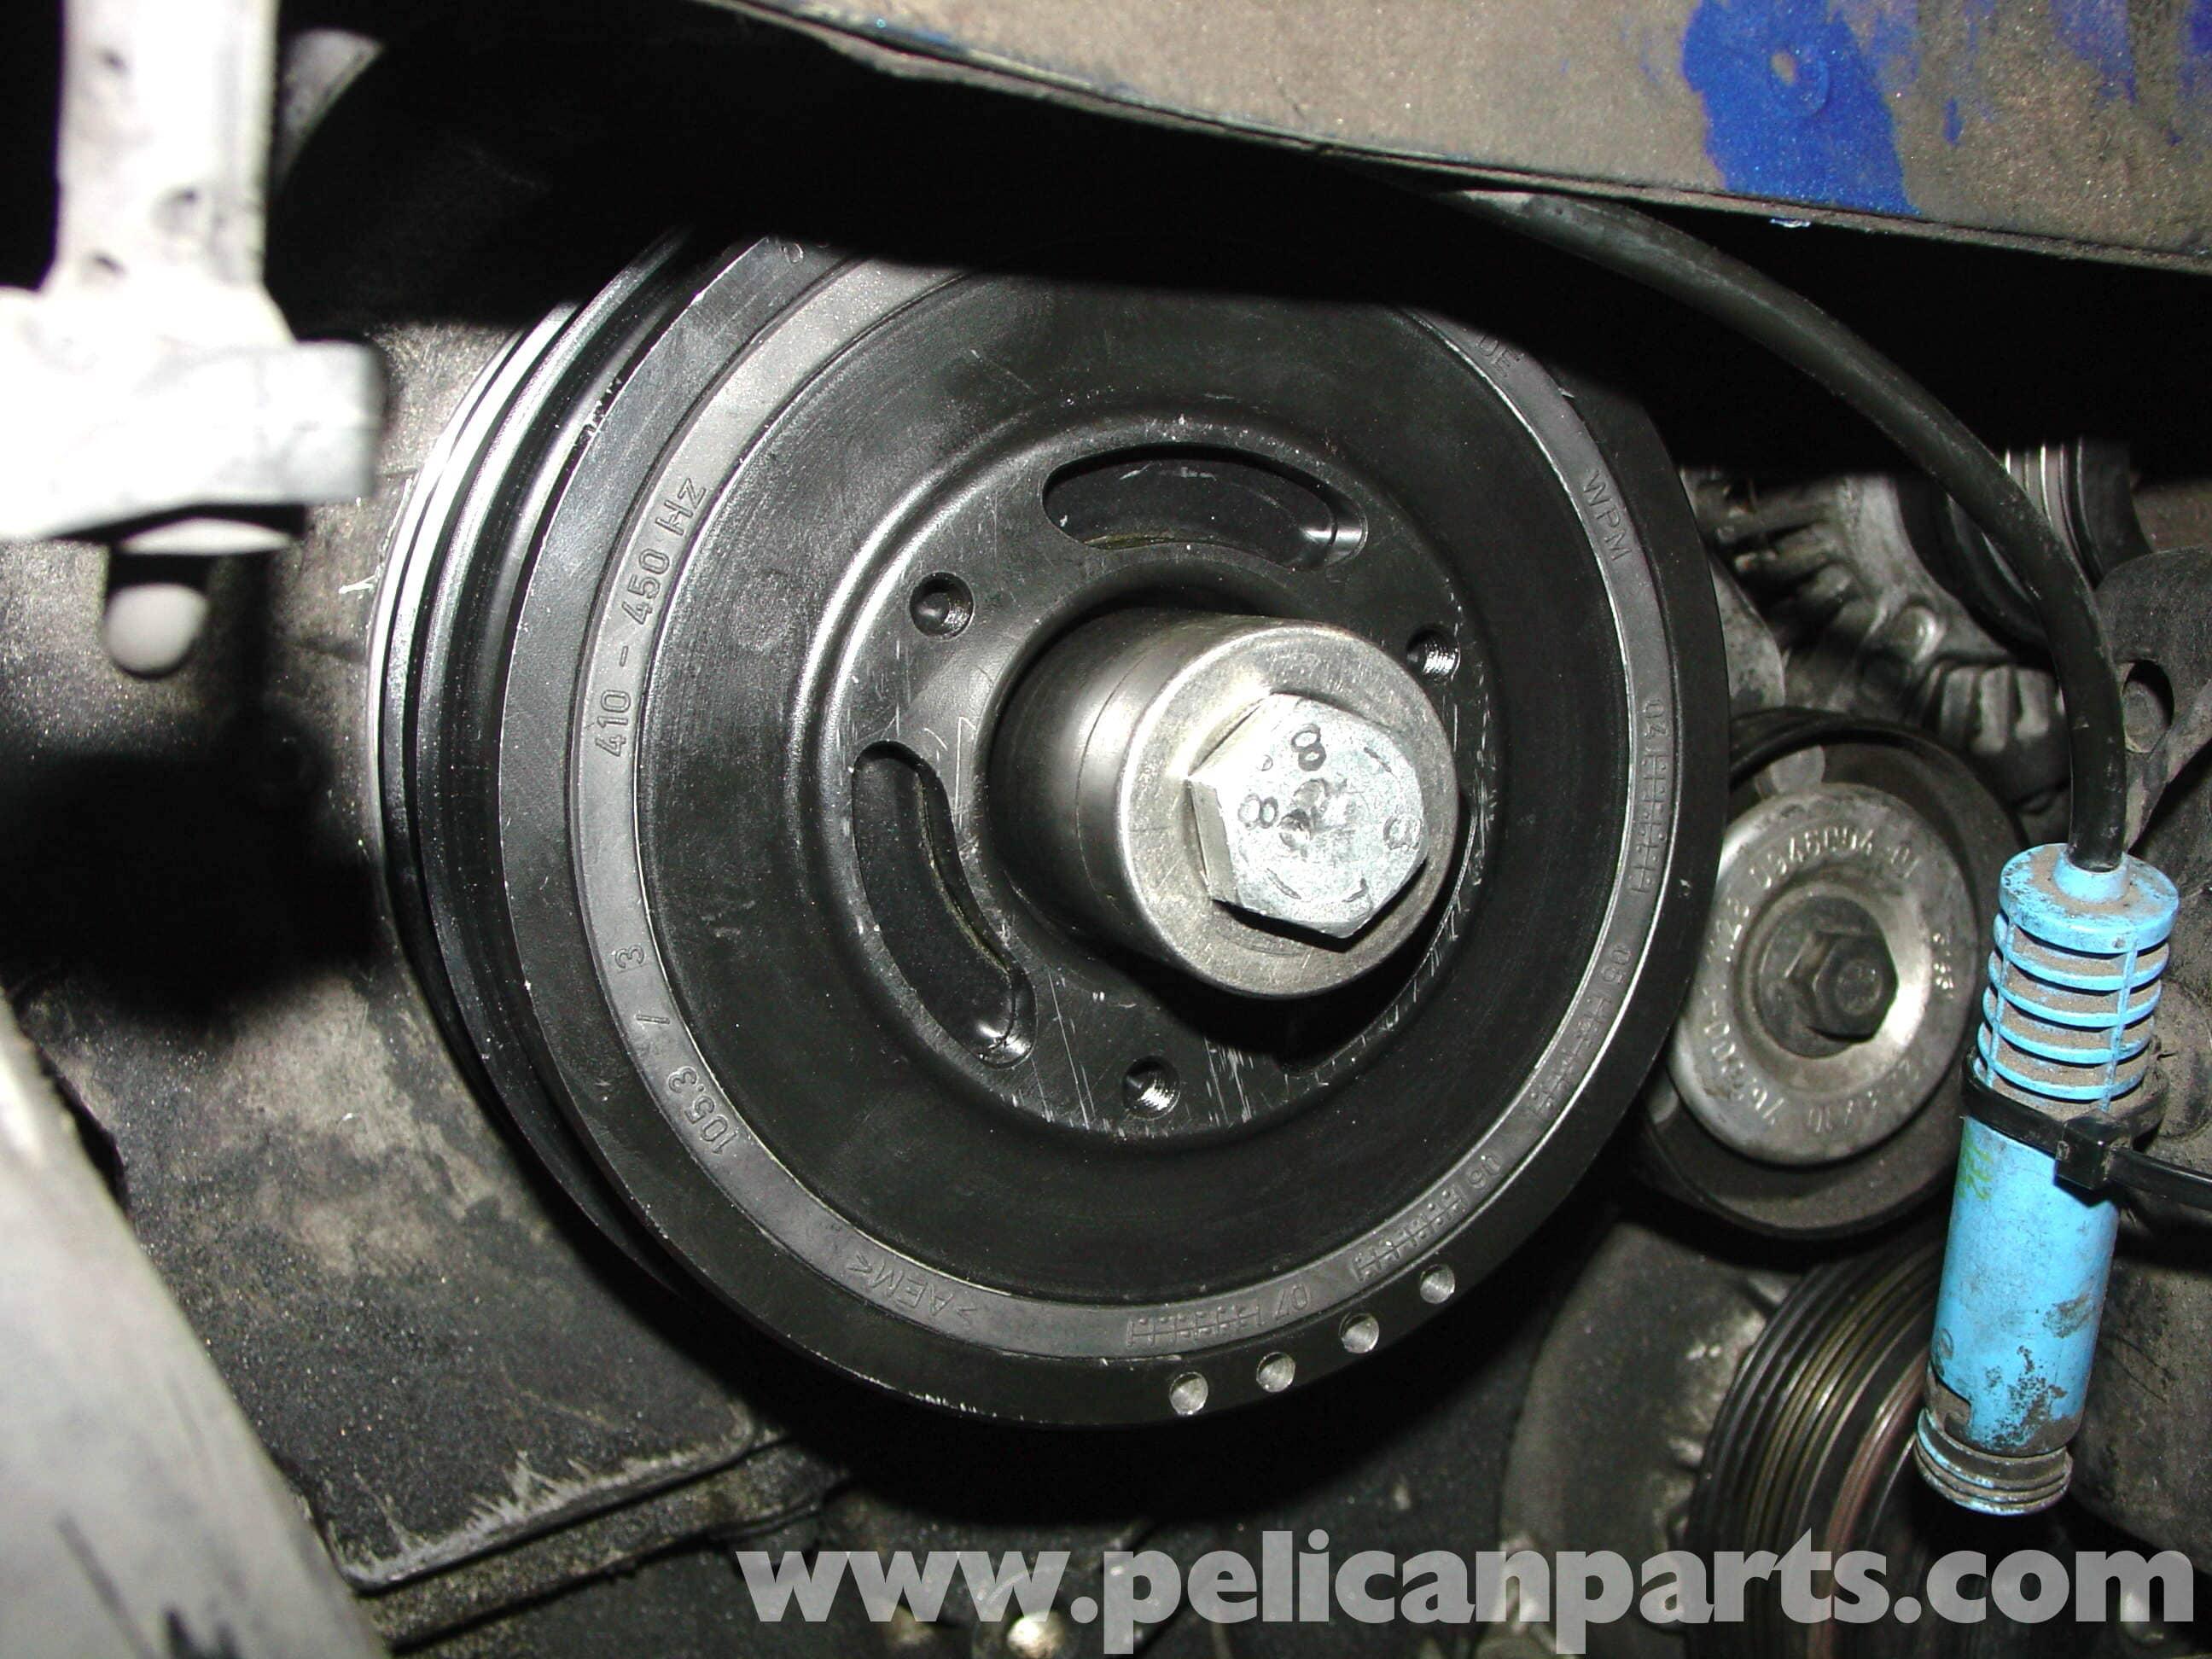 MINI Cooper Crankshaft Pulley Replacement (R50/R52/R53 2001-2006